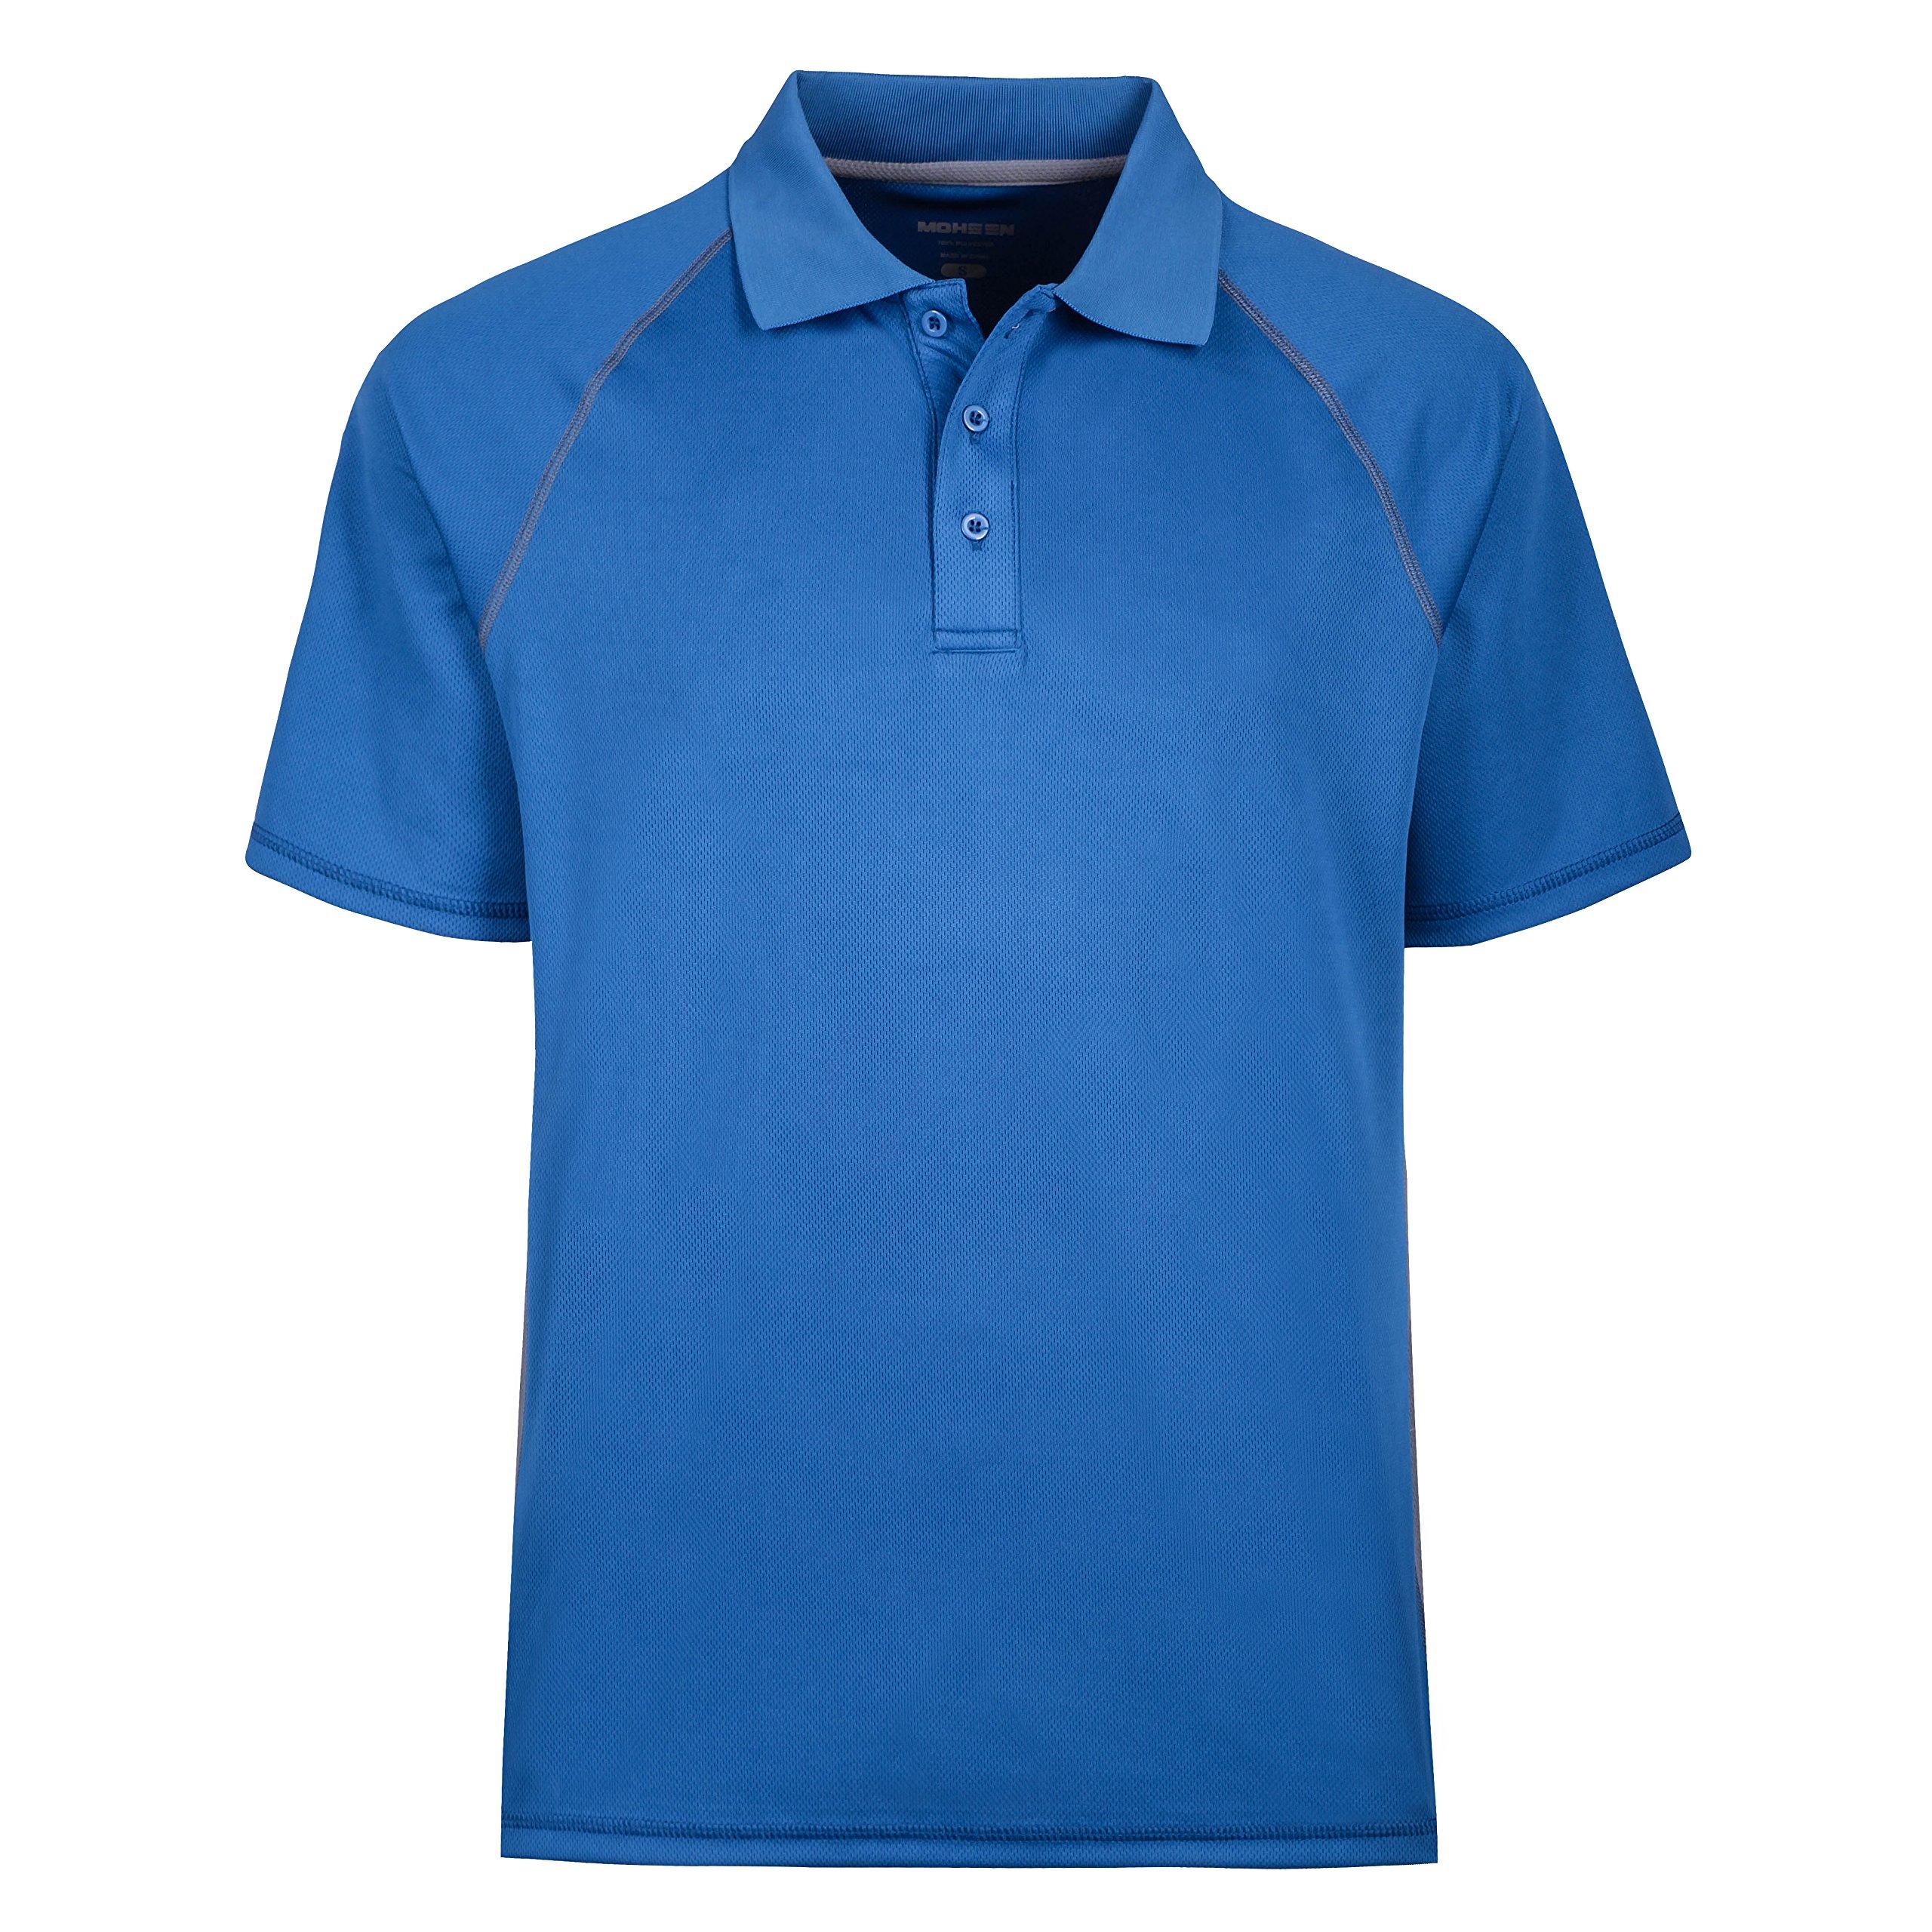 MOHEEN Men's Short Sleeve Moisture Wicking Performance Golf Polo Shirt, Side Blocked (5XL, Blue)